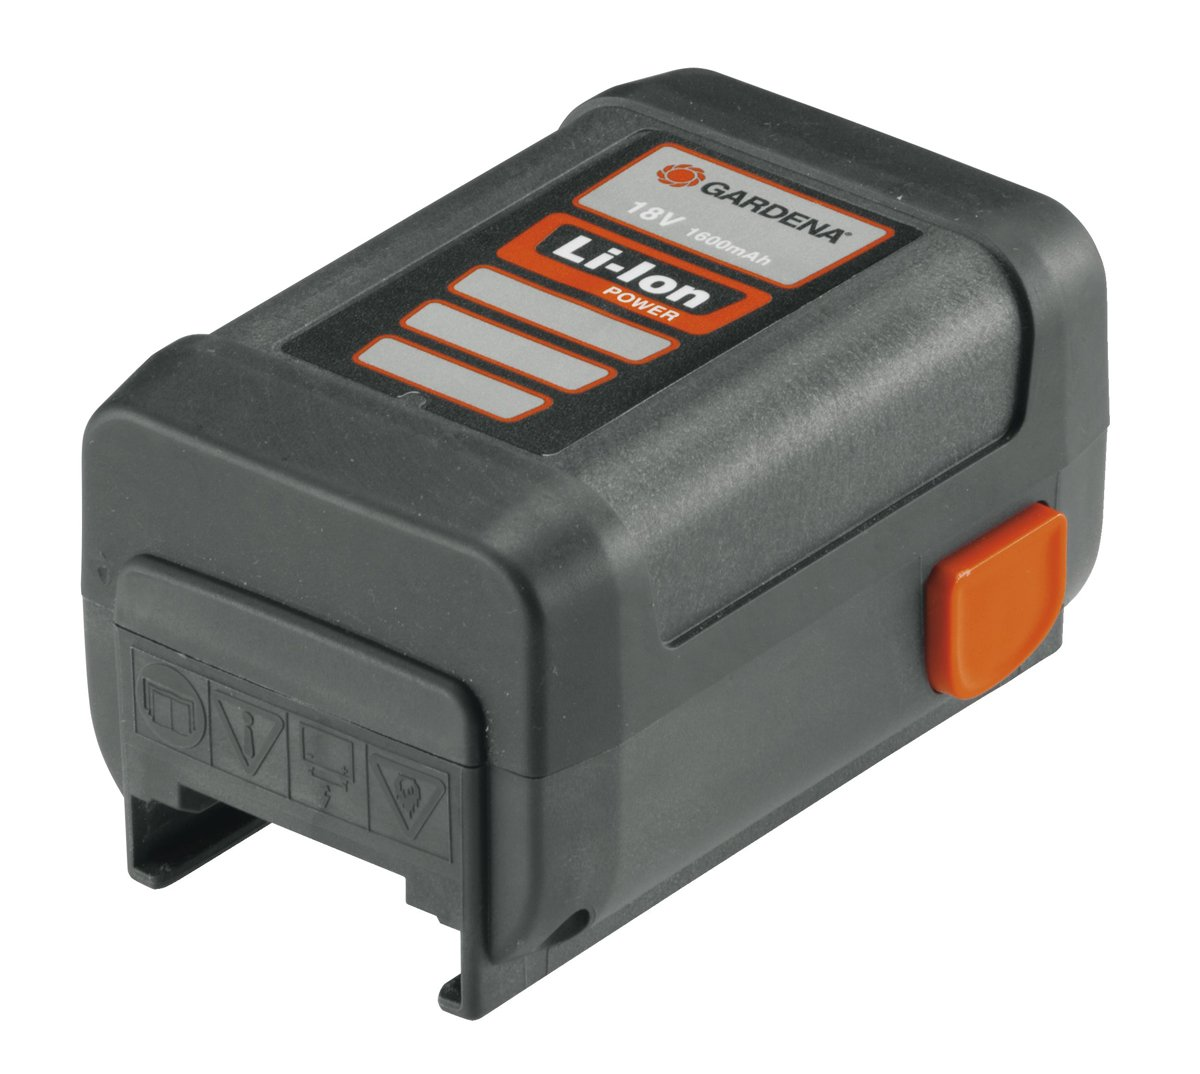 Gardena 8835-U 18-Volt Lithium Ion Cordless Tool Battery